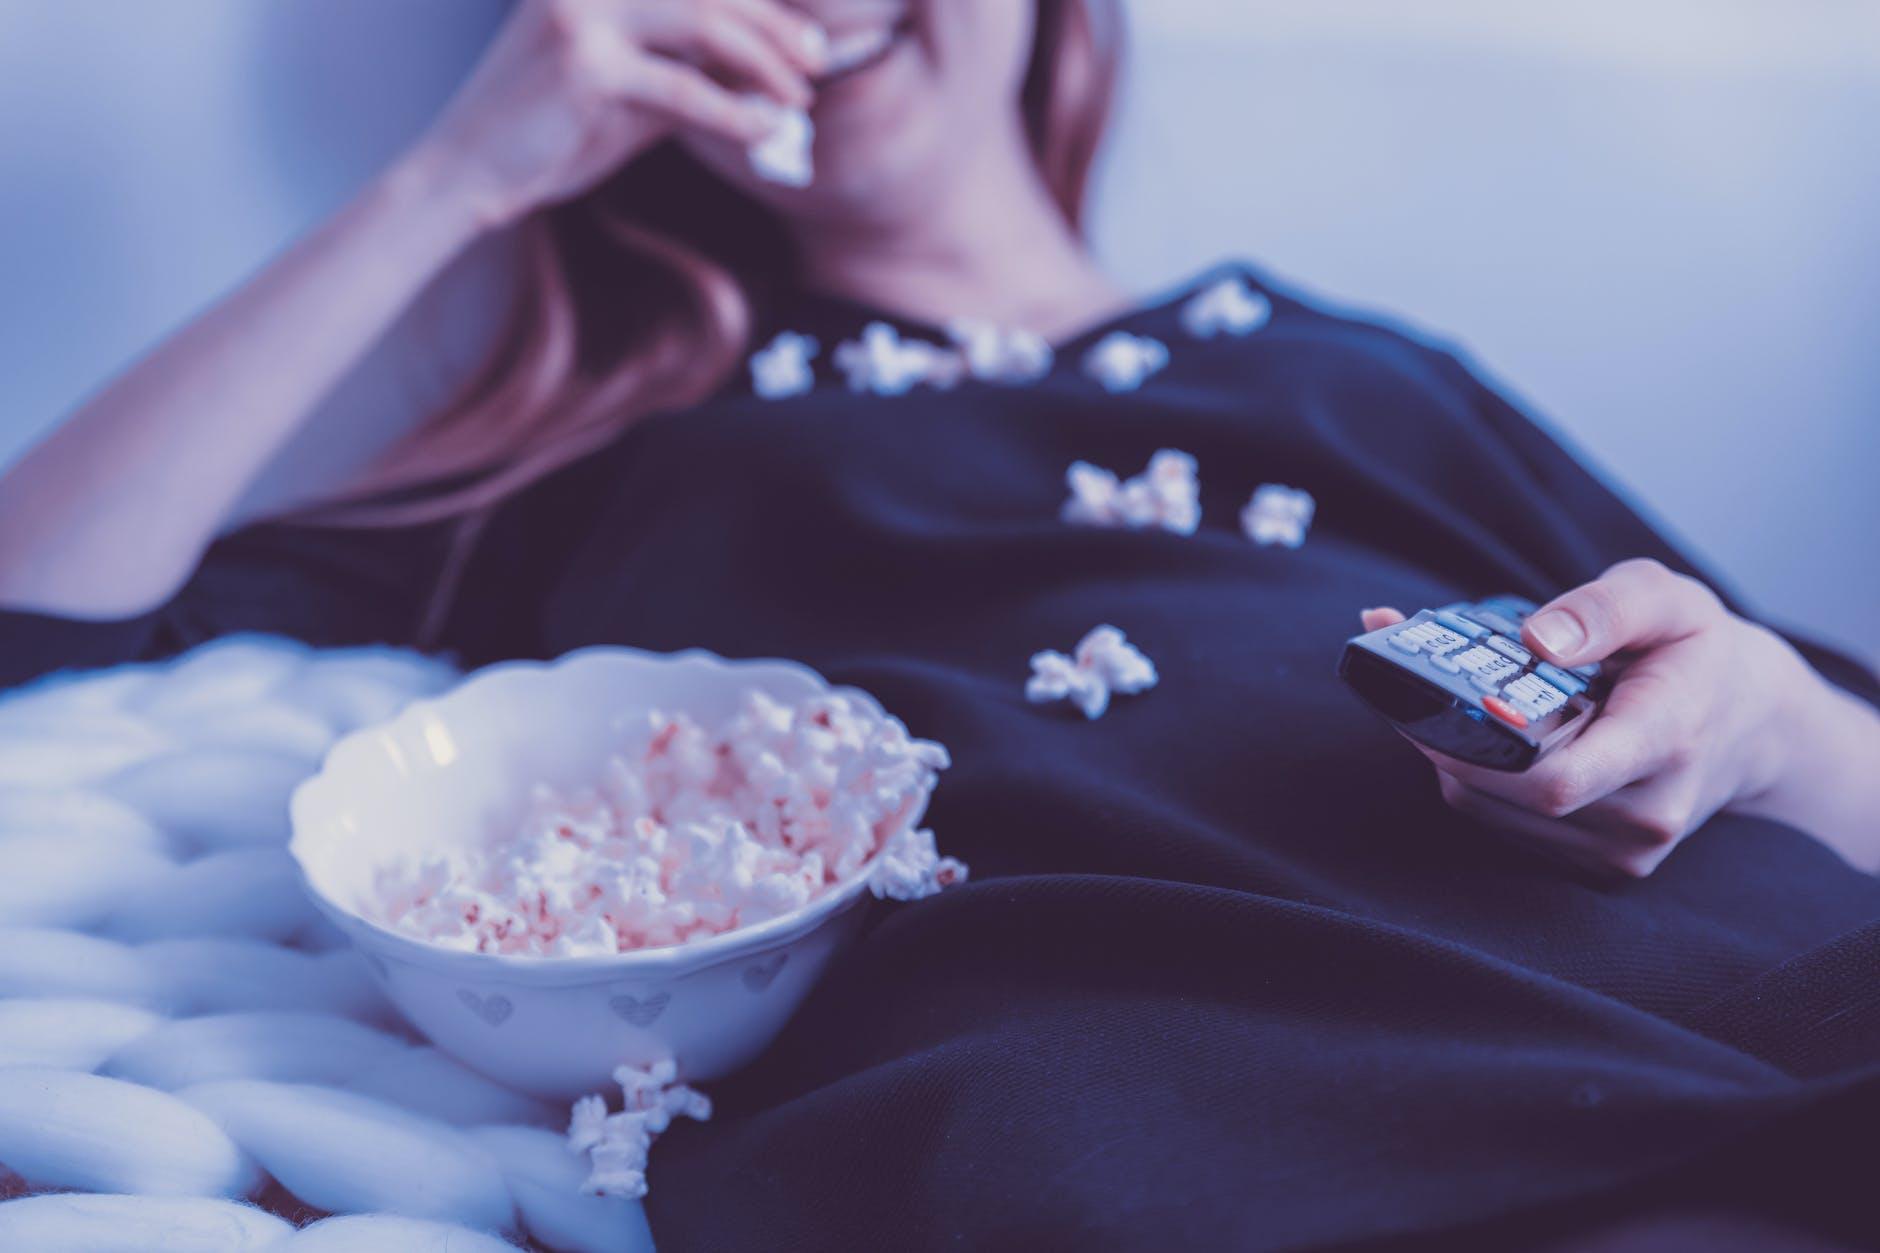 Movie and popcorn